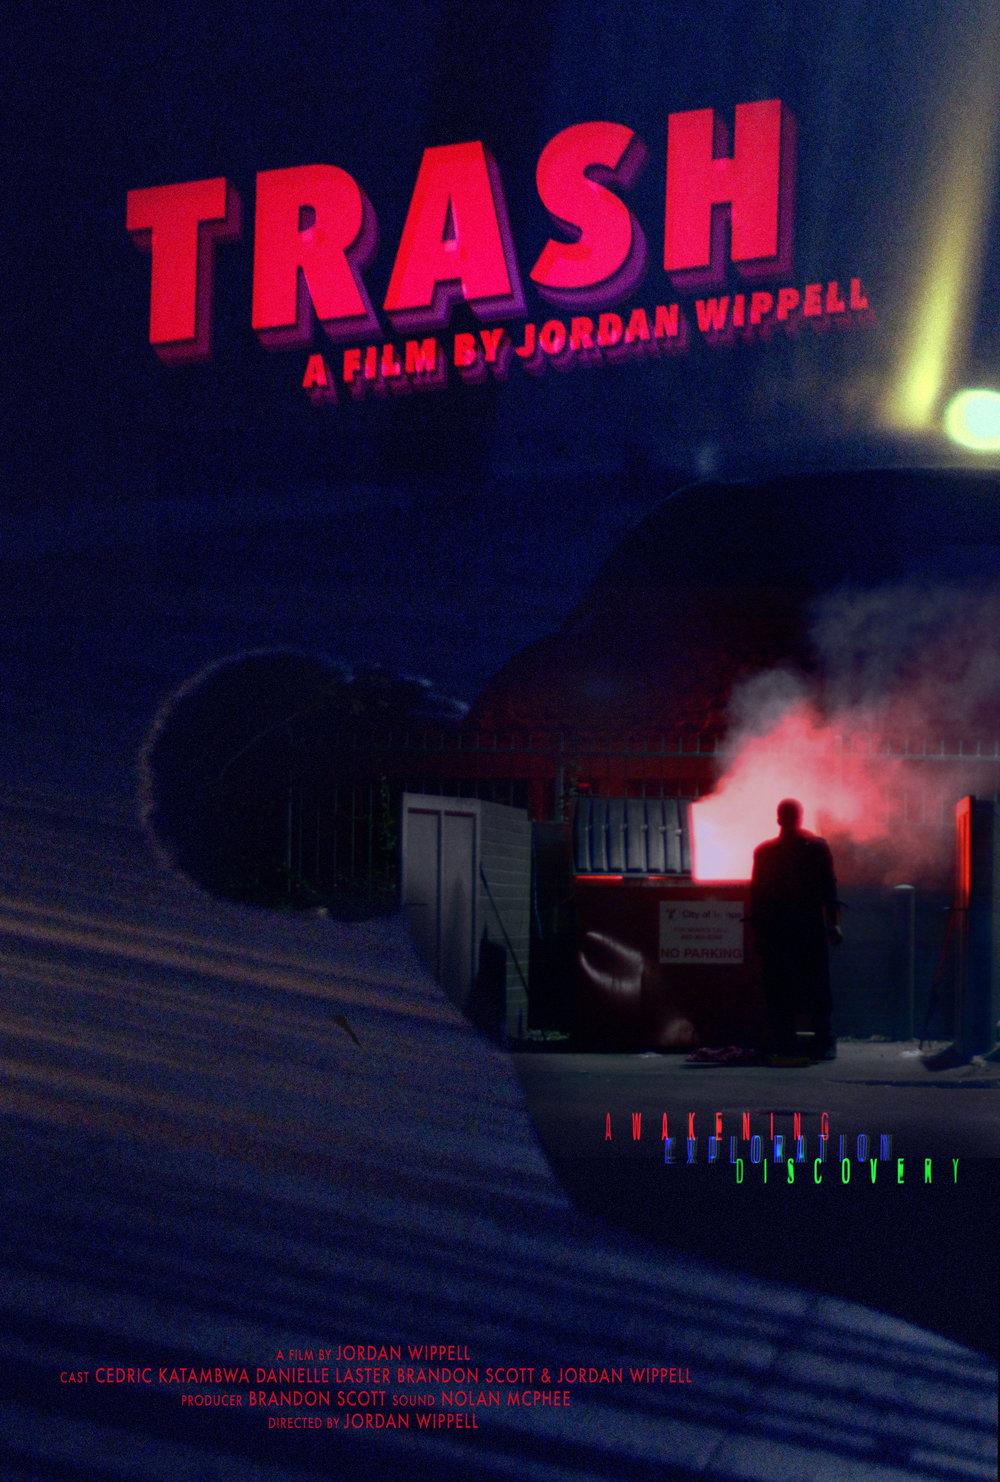 Trash (2016) - Producer/Assistant Camera